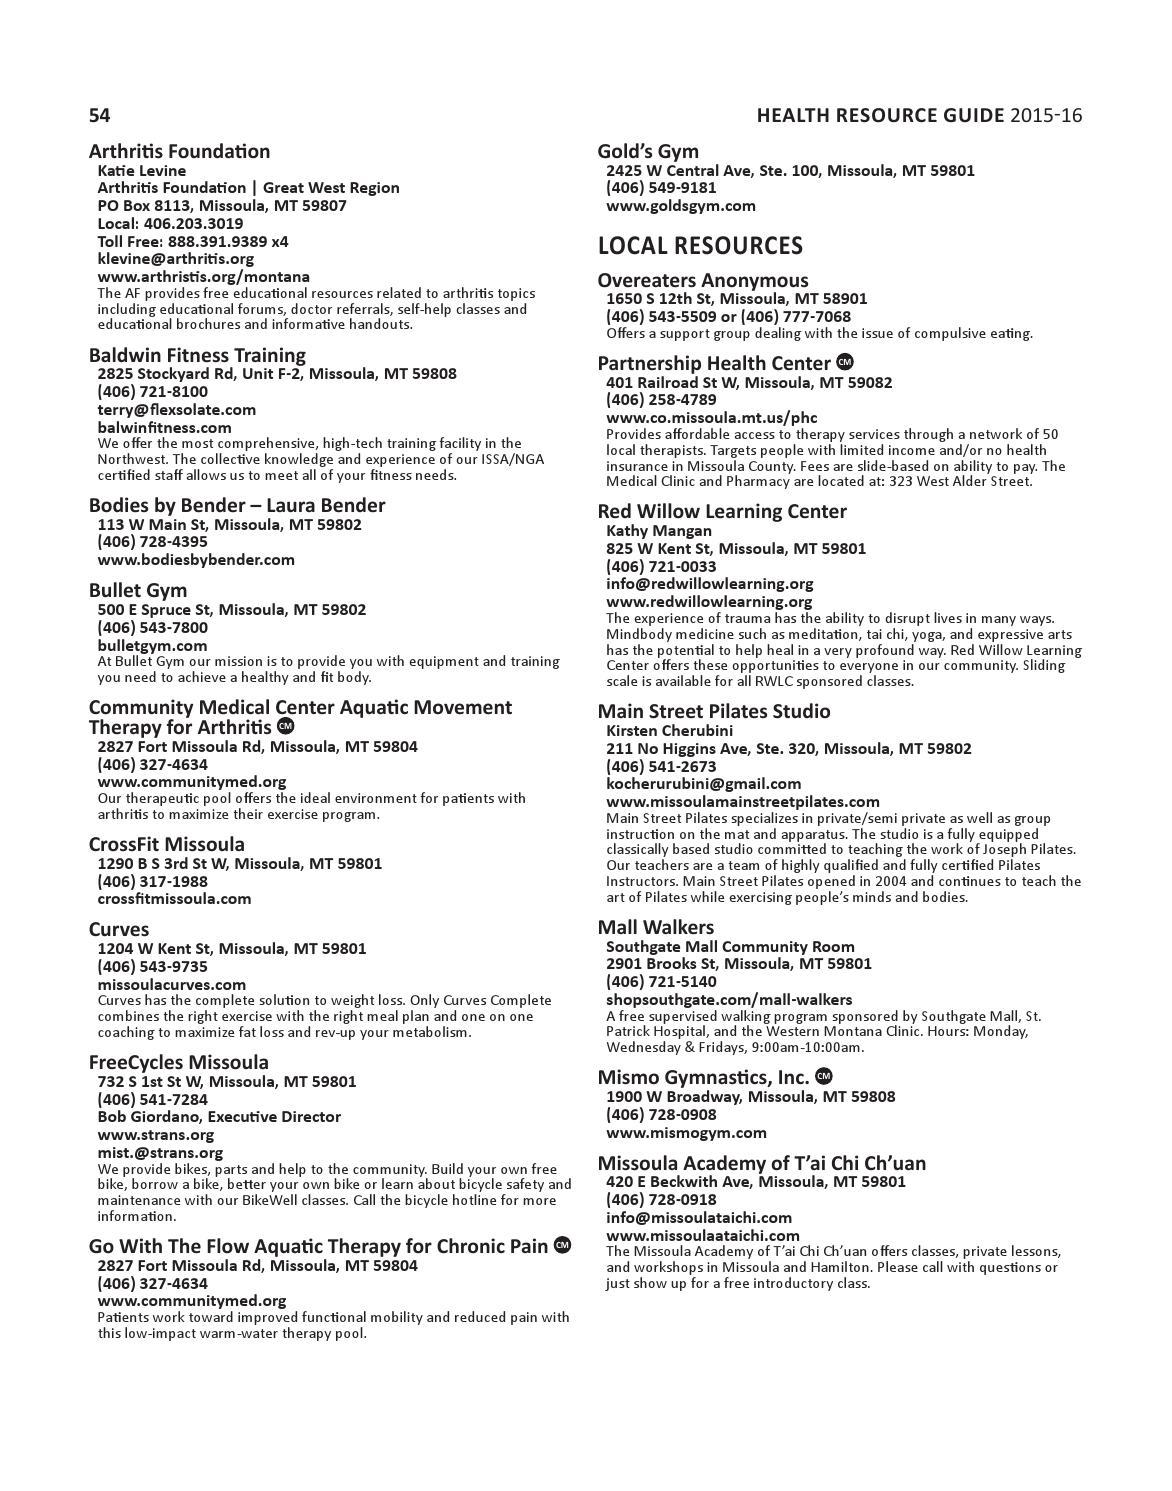 Health Resource Guide 2015 by Missoulian - issuu